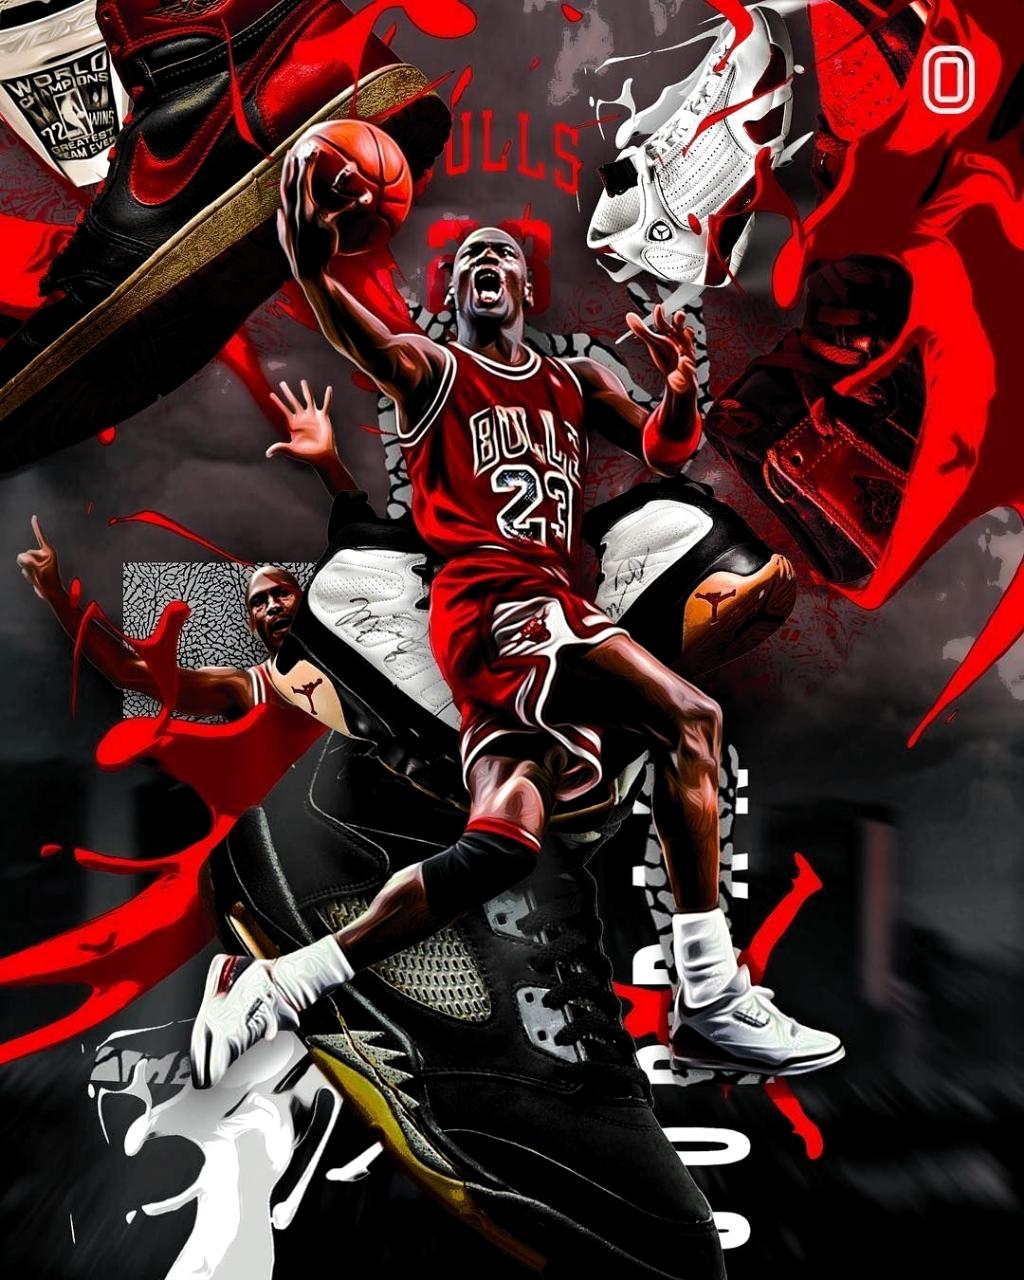 Climbing Michael Jordan Wallpapers Michael Jordan Wallpapers Art Tatuajes De Michael Fotos De Michael Jordan Jugadores De Baloncesto Fotos De Baloncesto